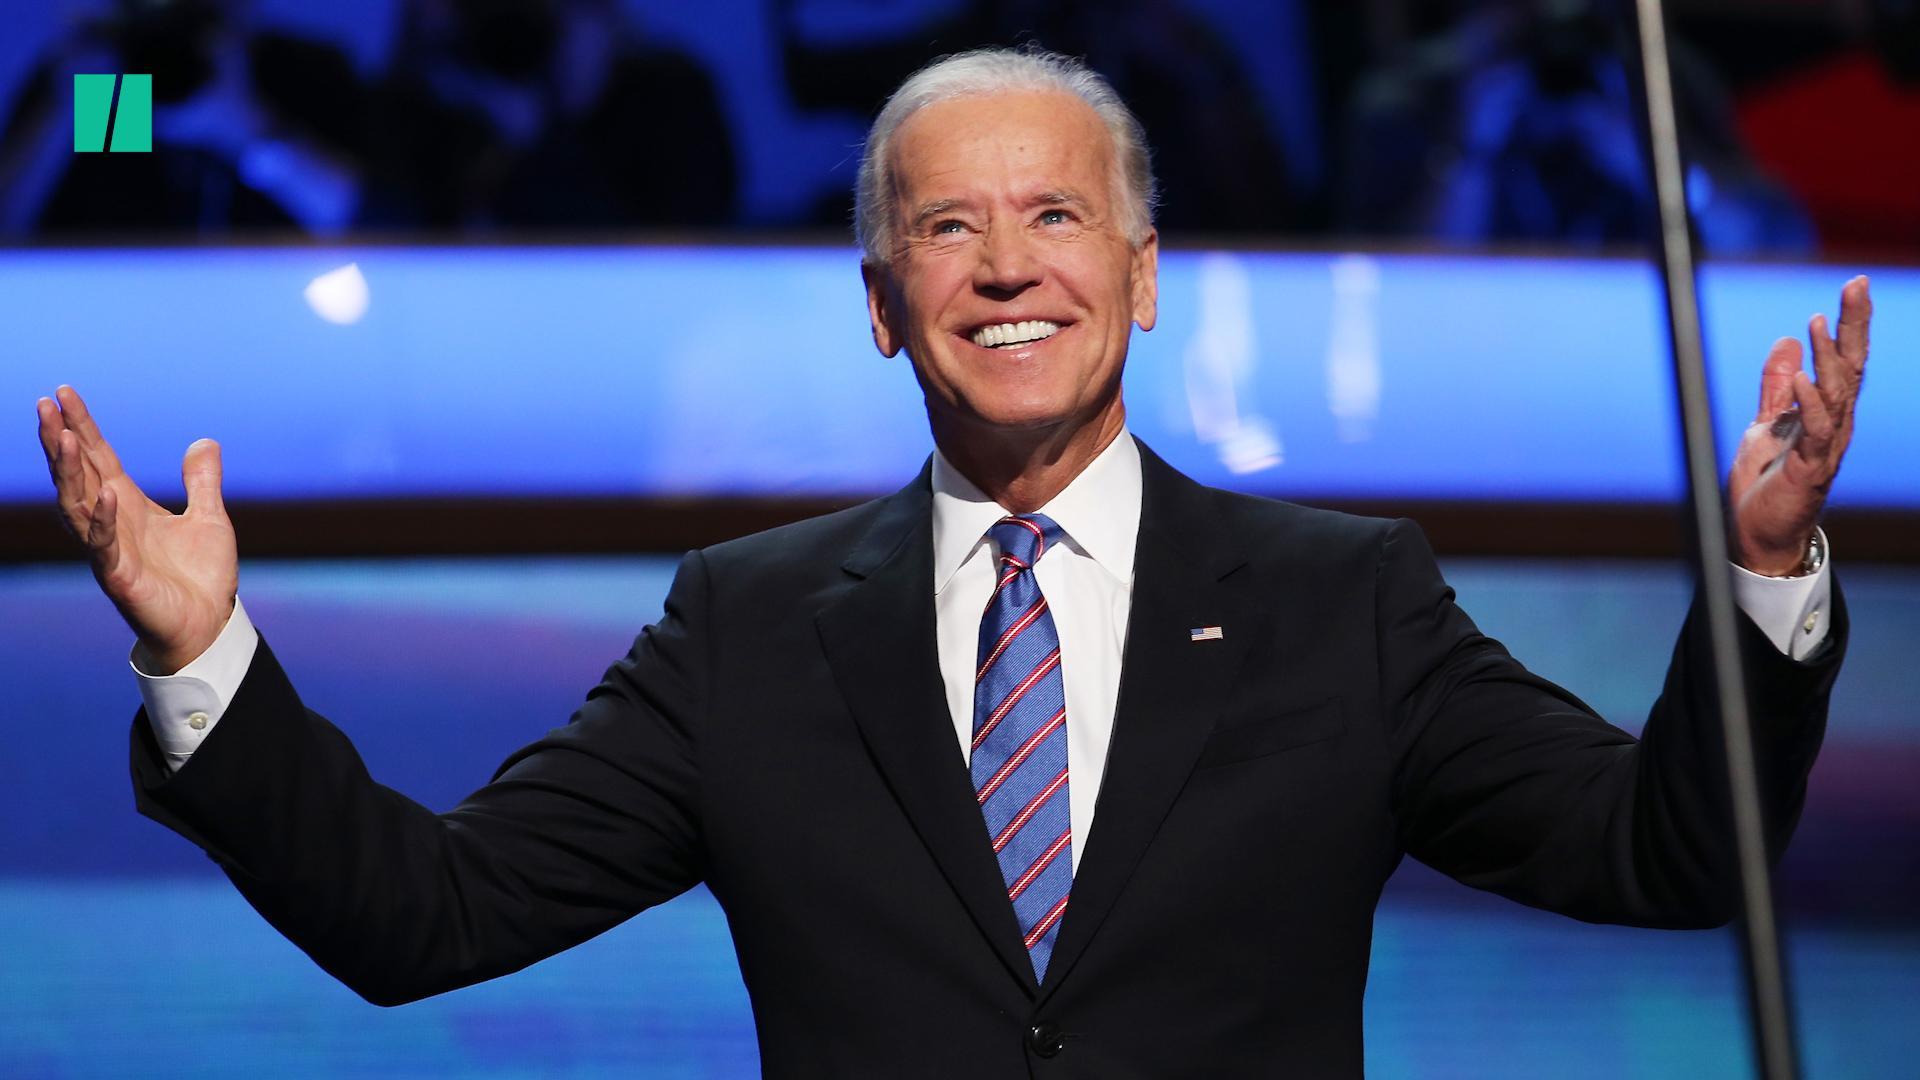 Ex-Bernie Sanders Press Secretary Joins Biden's Campaign As Senior Adviser